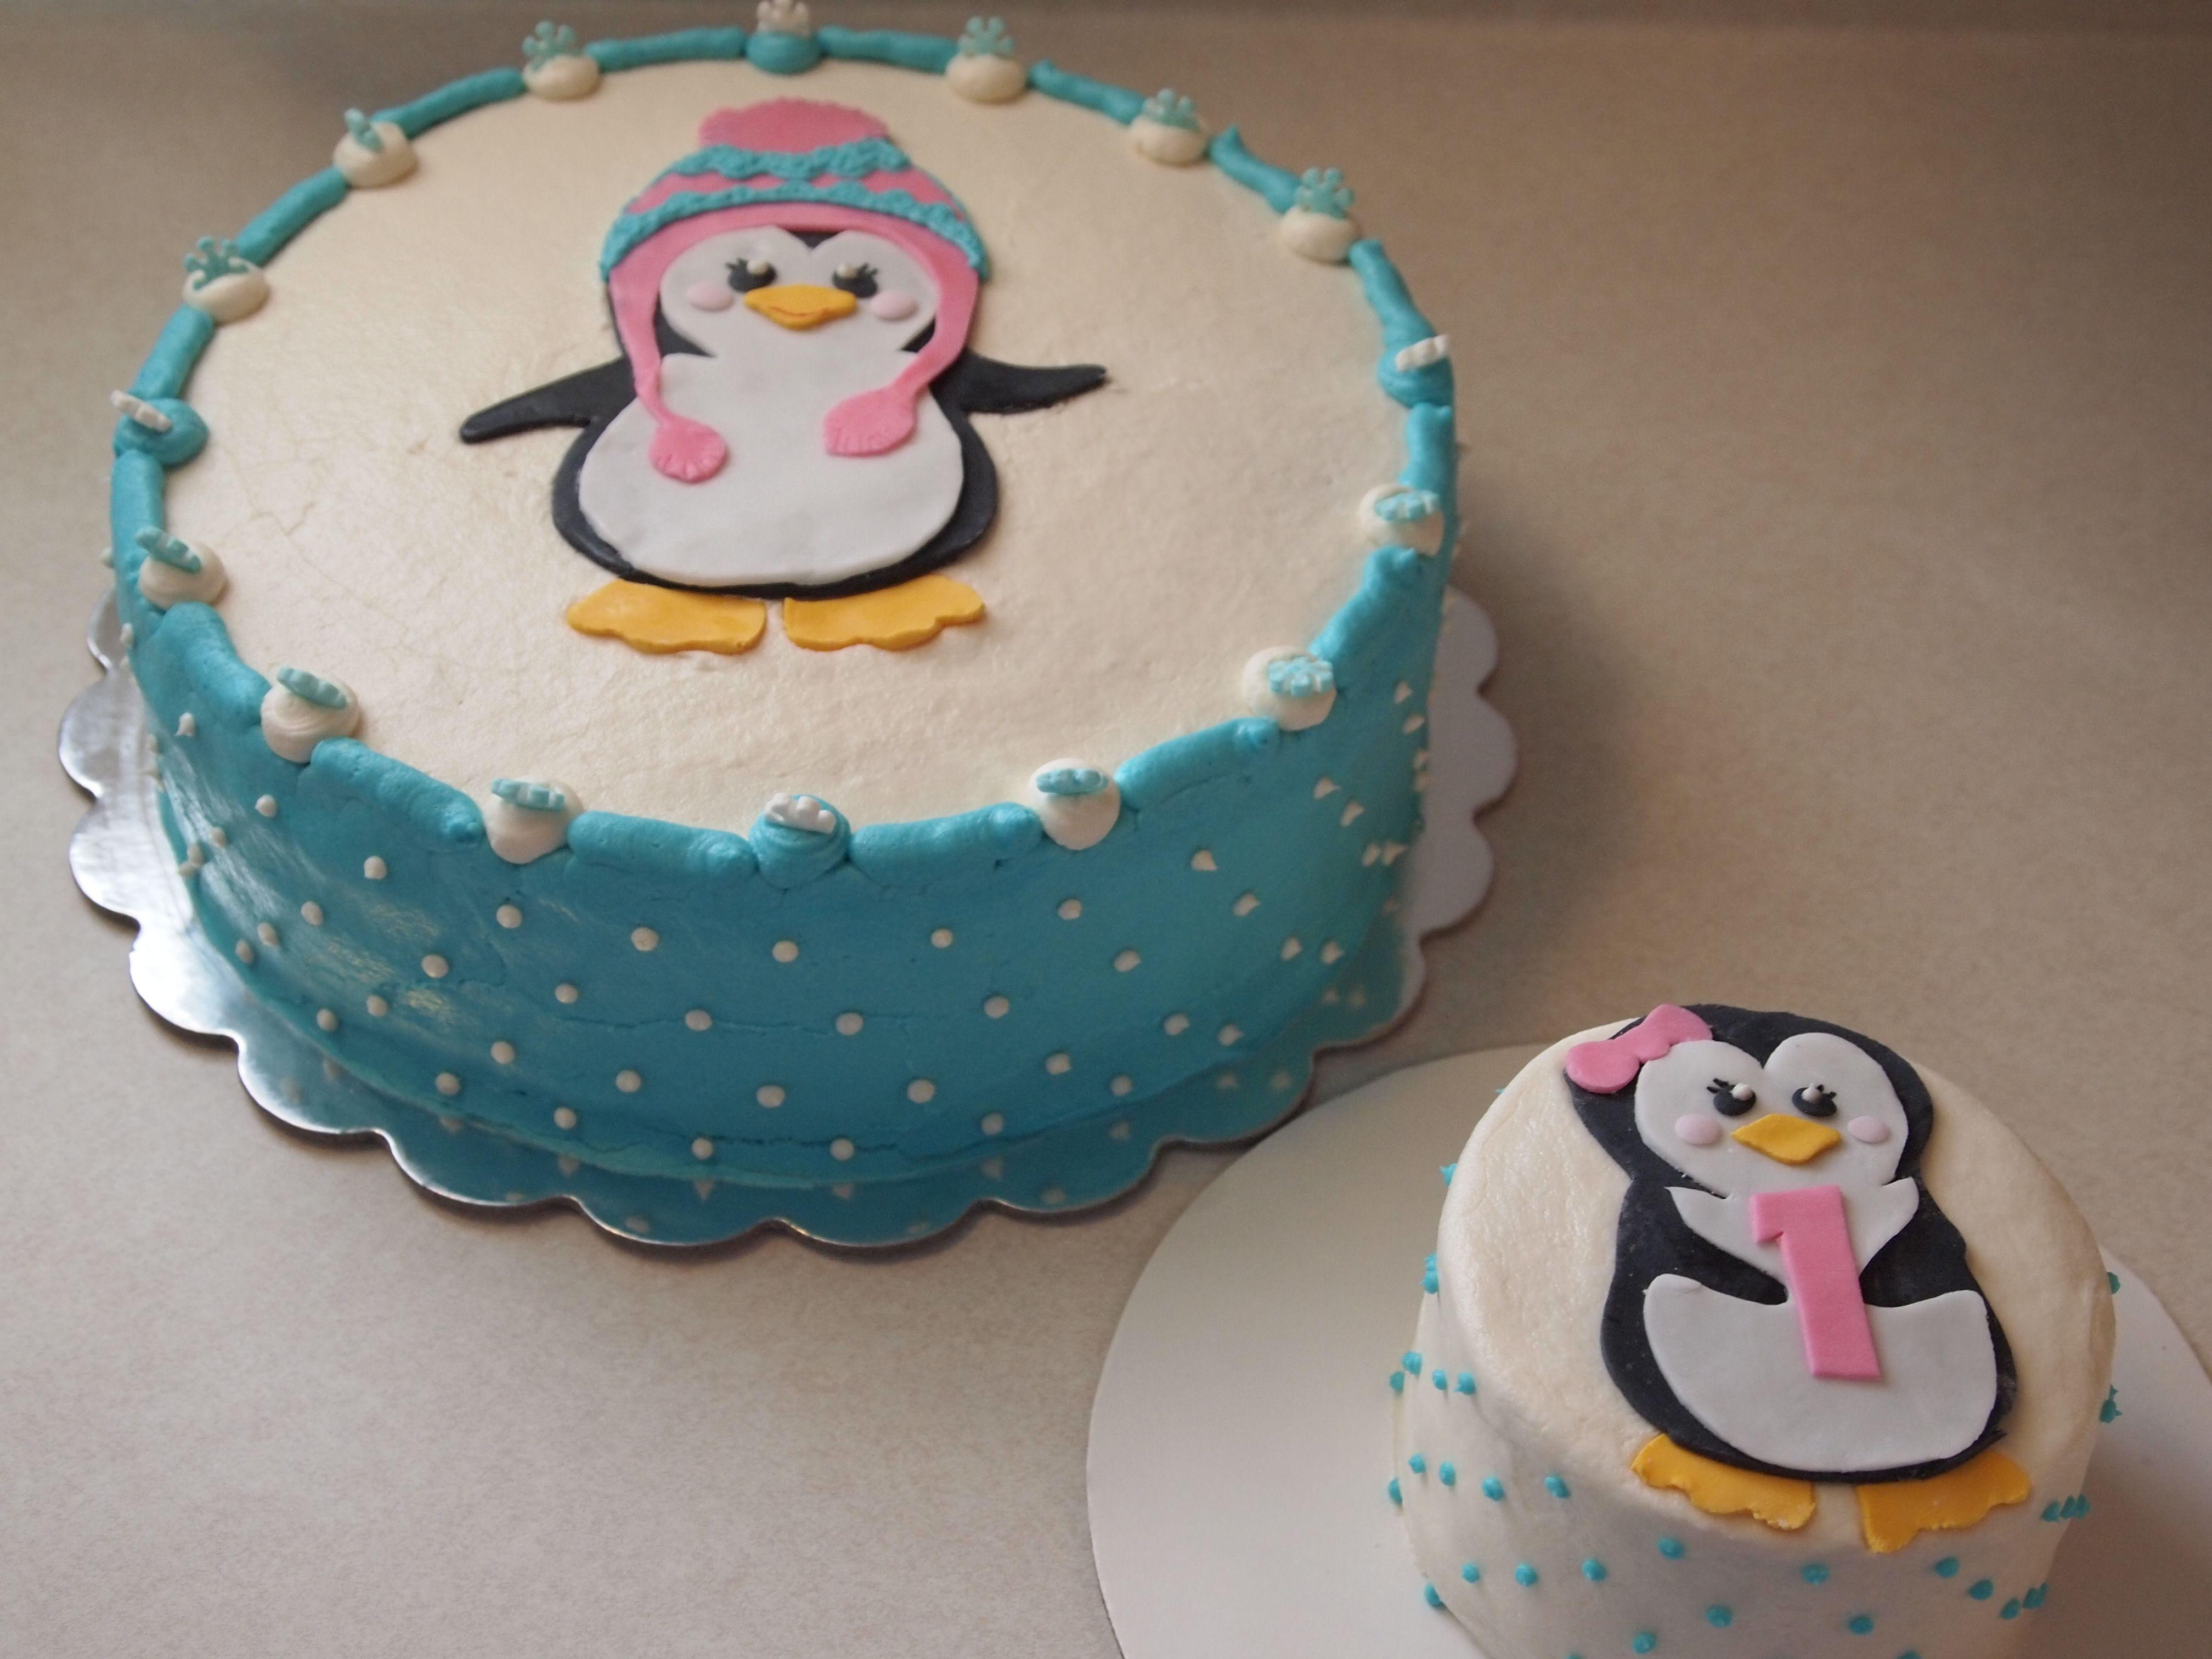 Penguin First Birthday Cake Baked By The Flour Fairy Pinterest